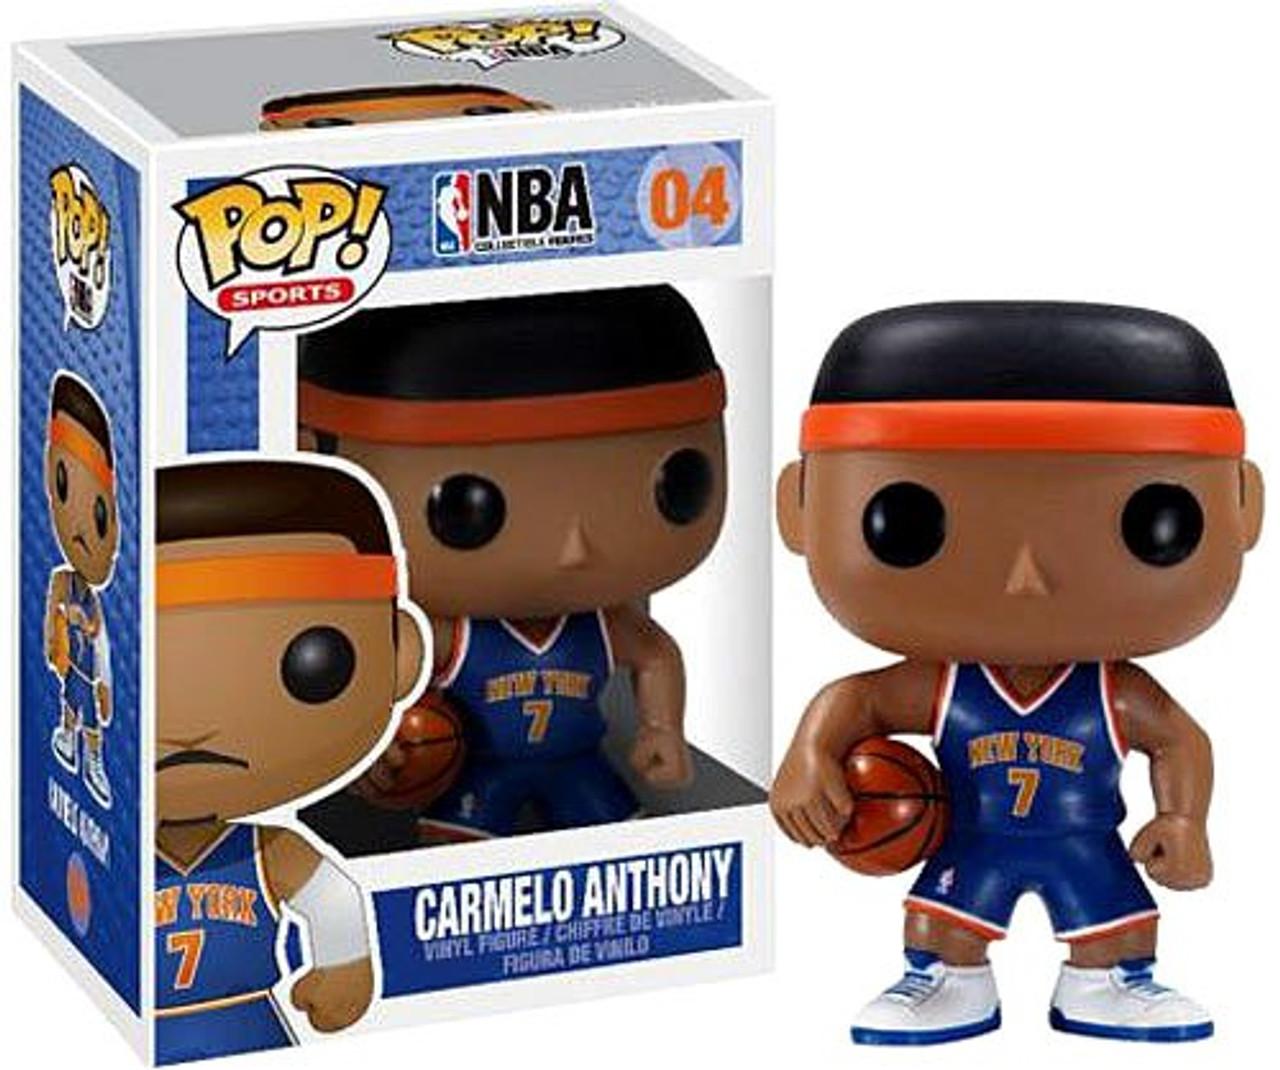 93f13d4e989 Funko NBA Funko POP Sports Carmelo Anthony Vinyl Figure 4 - ToyWiz